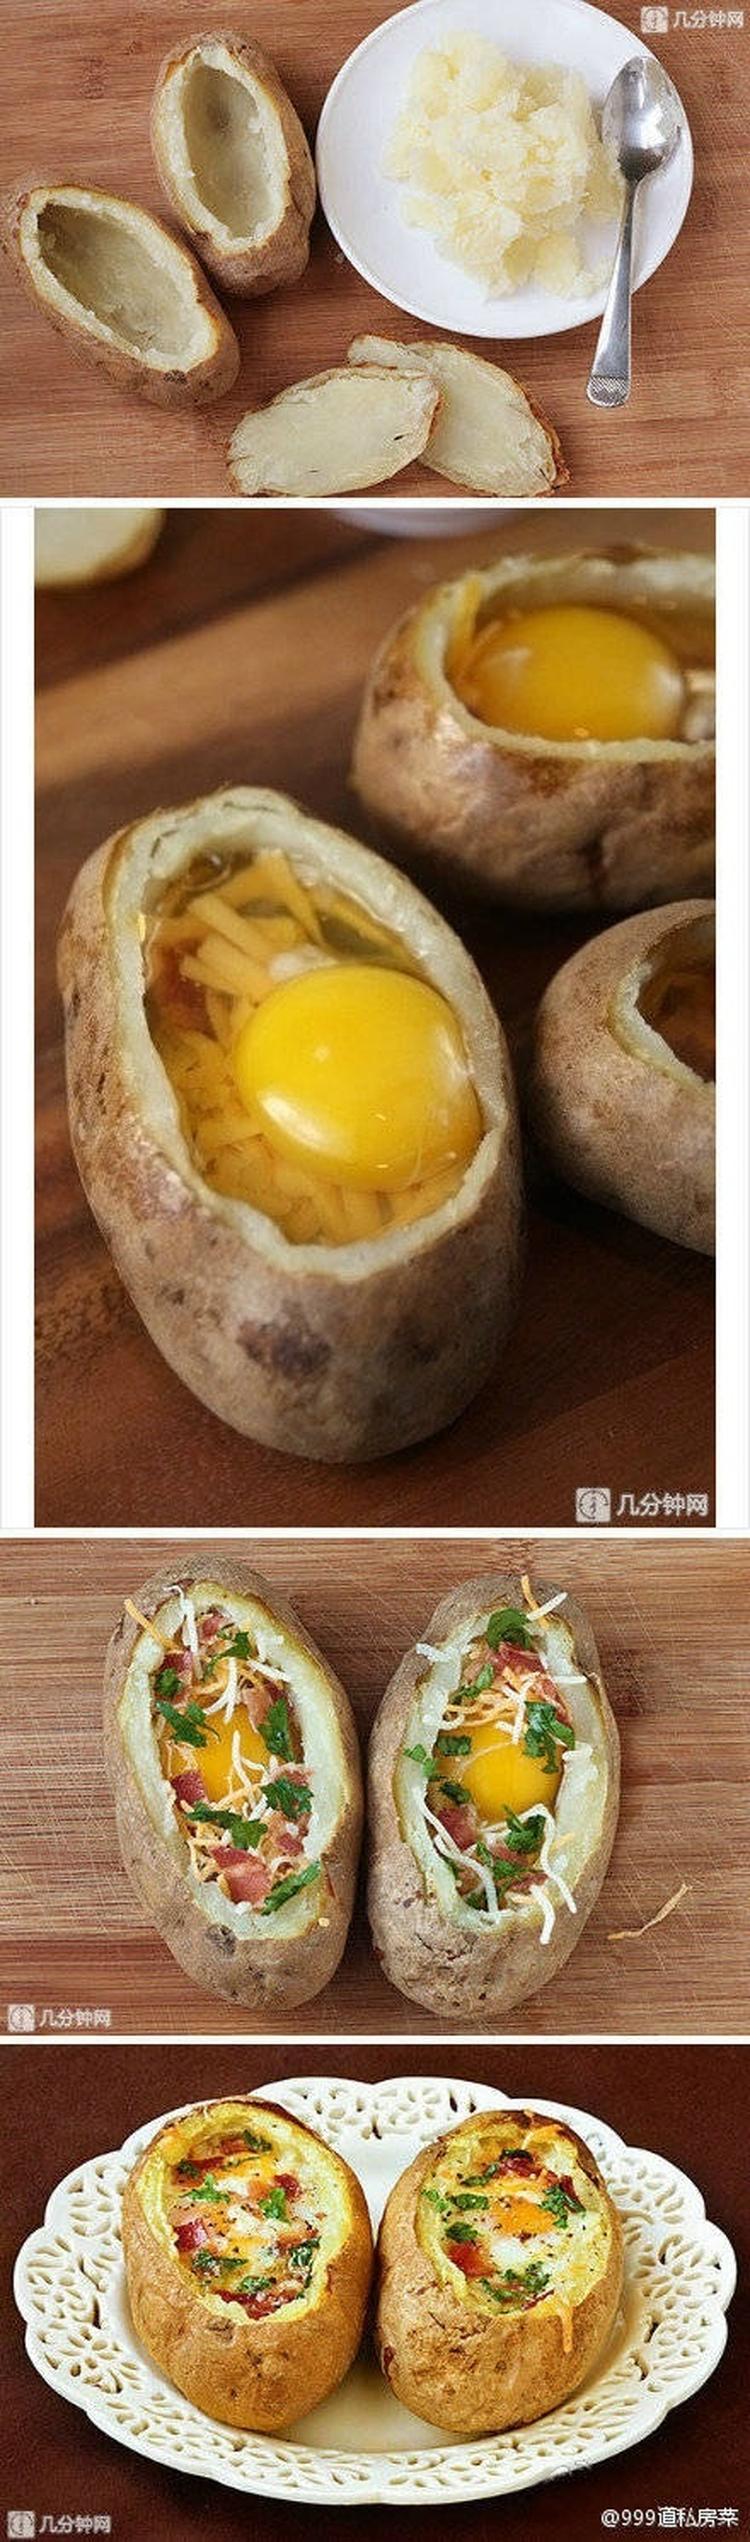 1-baked-potato-1-Tbsp-butter-2-eggs-2-strips-bacon-cooked-2-Tbsp.1382559099-van-WorldOfDreams_eK30BQs